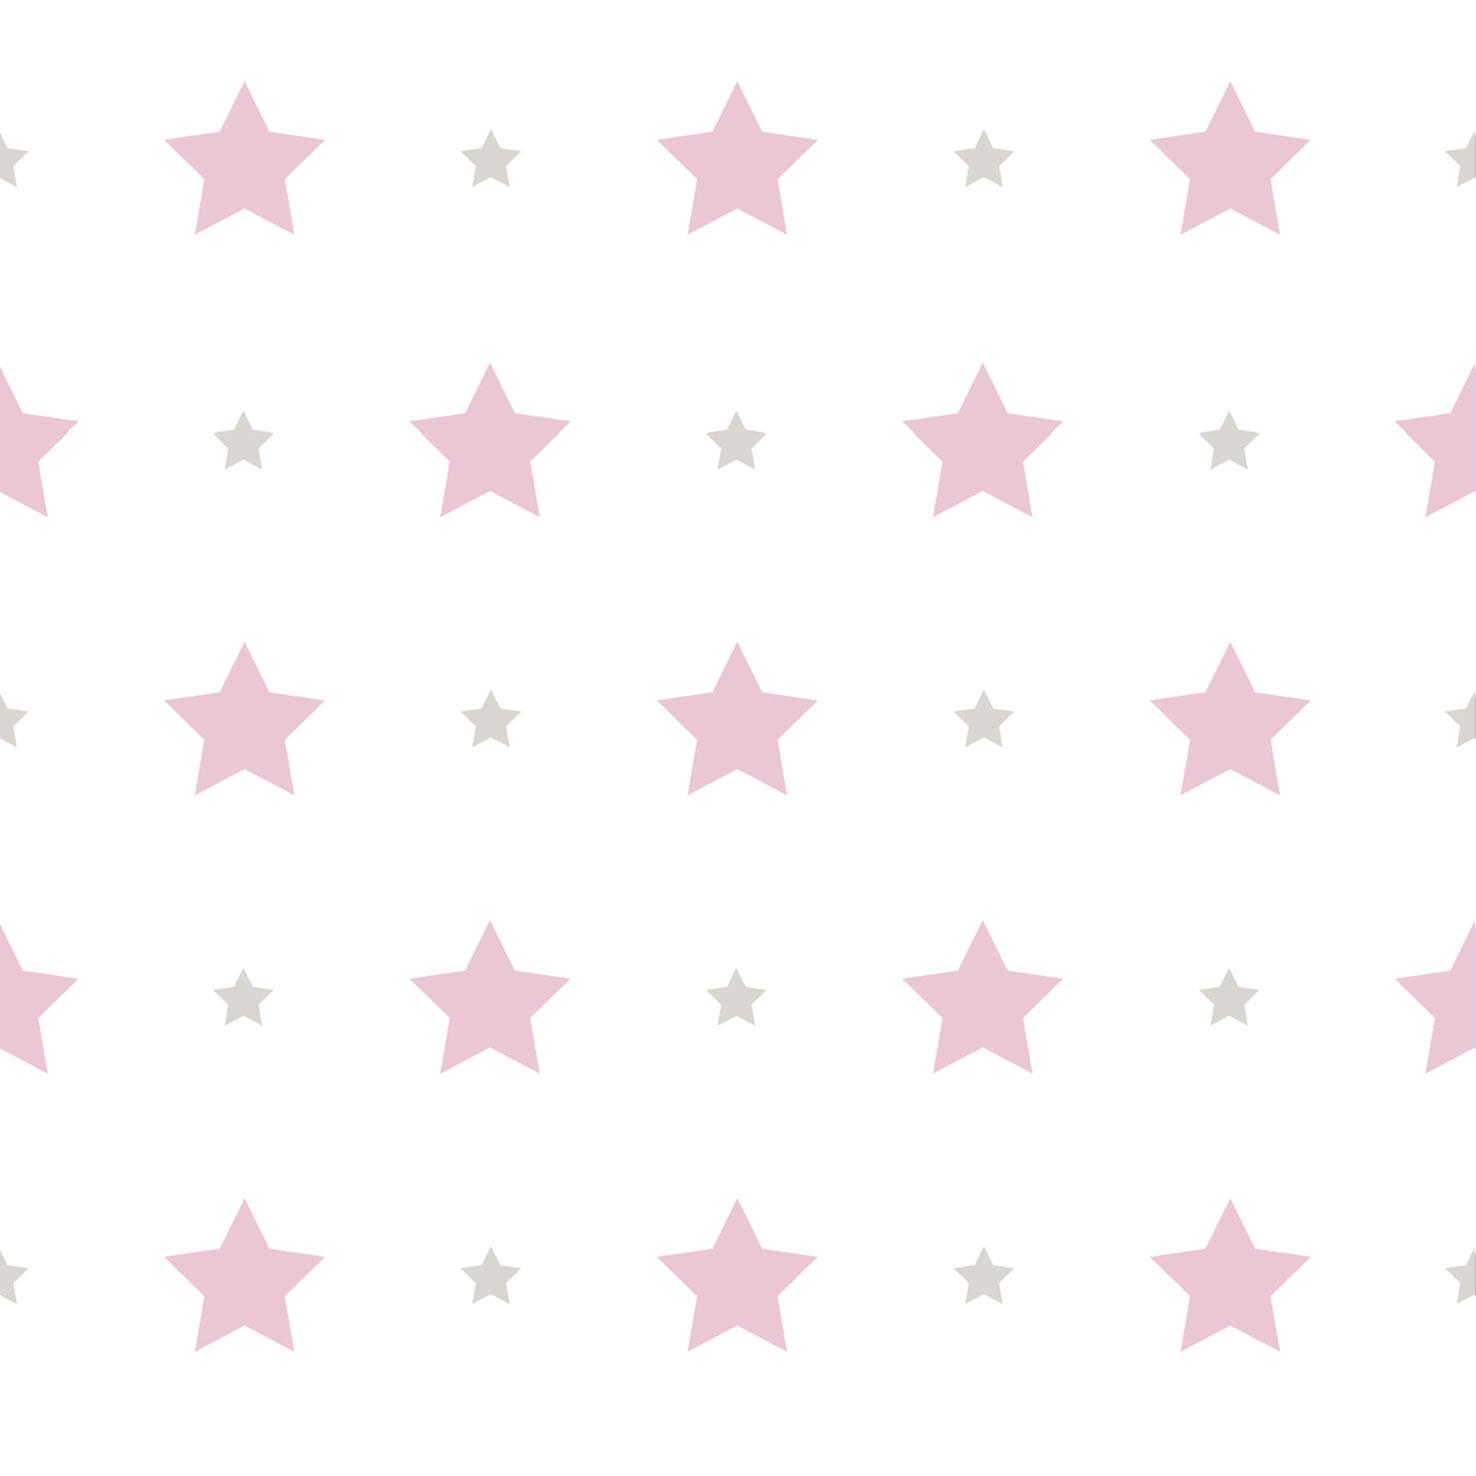 Tapete kinder sterne stern rasch textil wei pink 330136 - Sterne tapete kinderzimmer ...